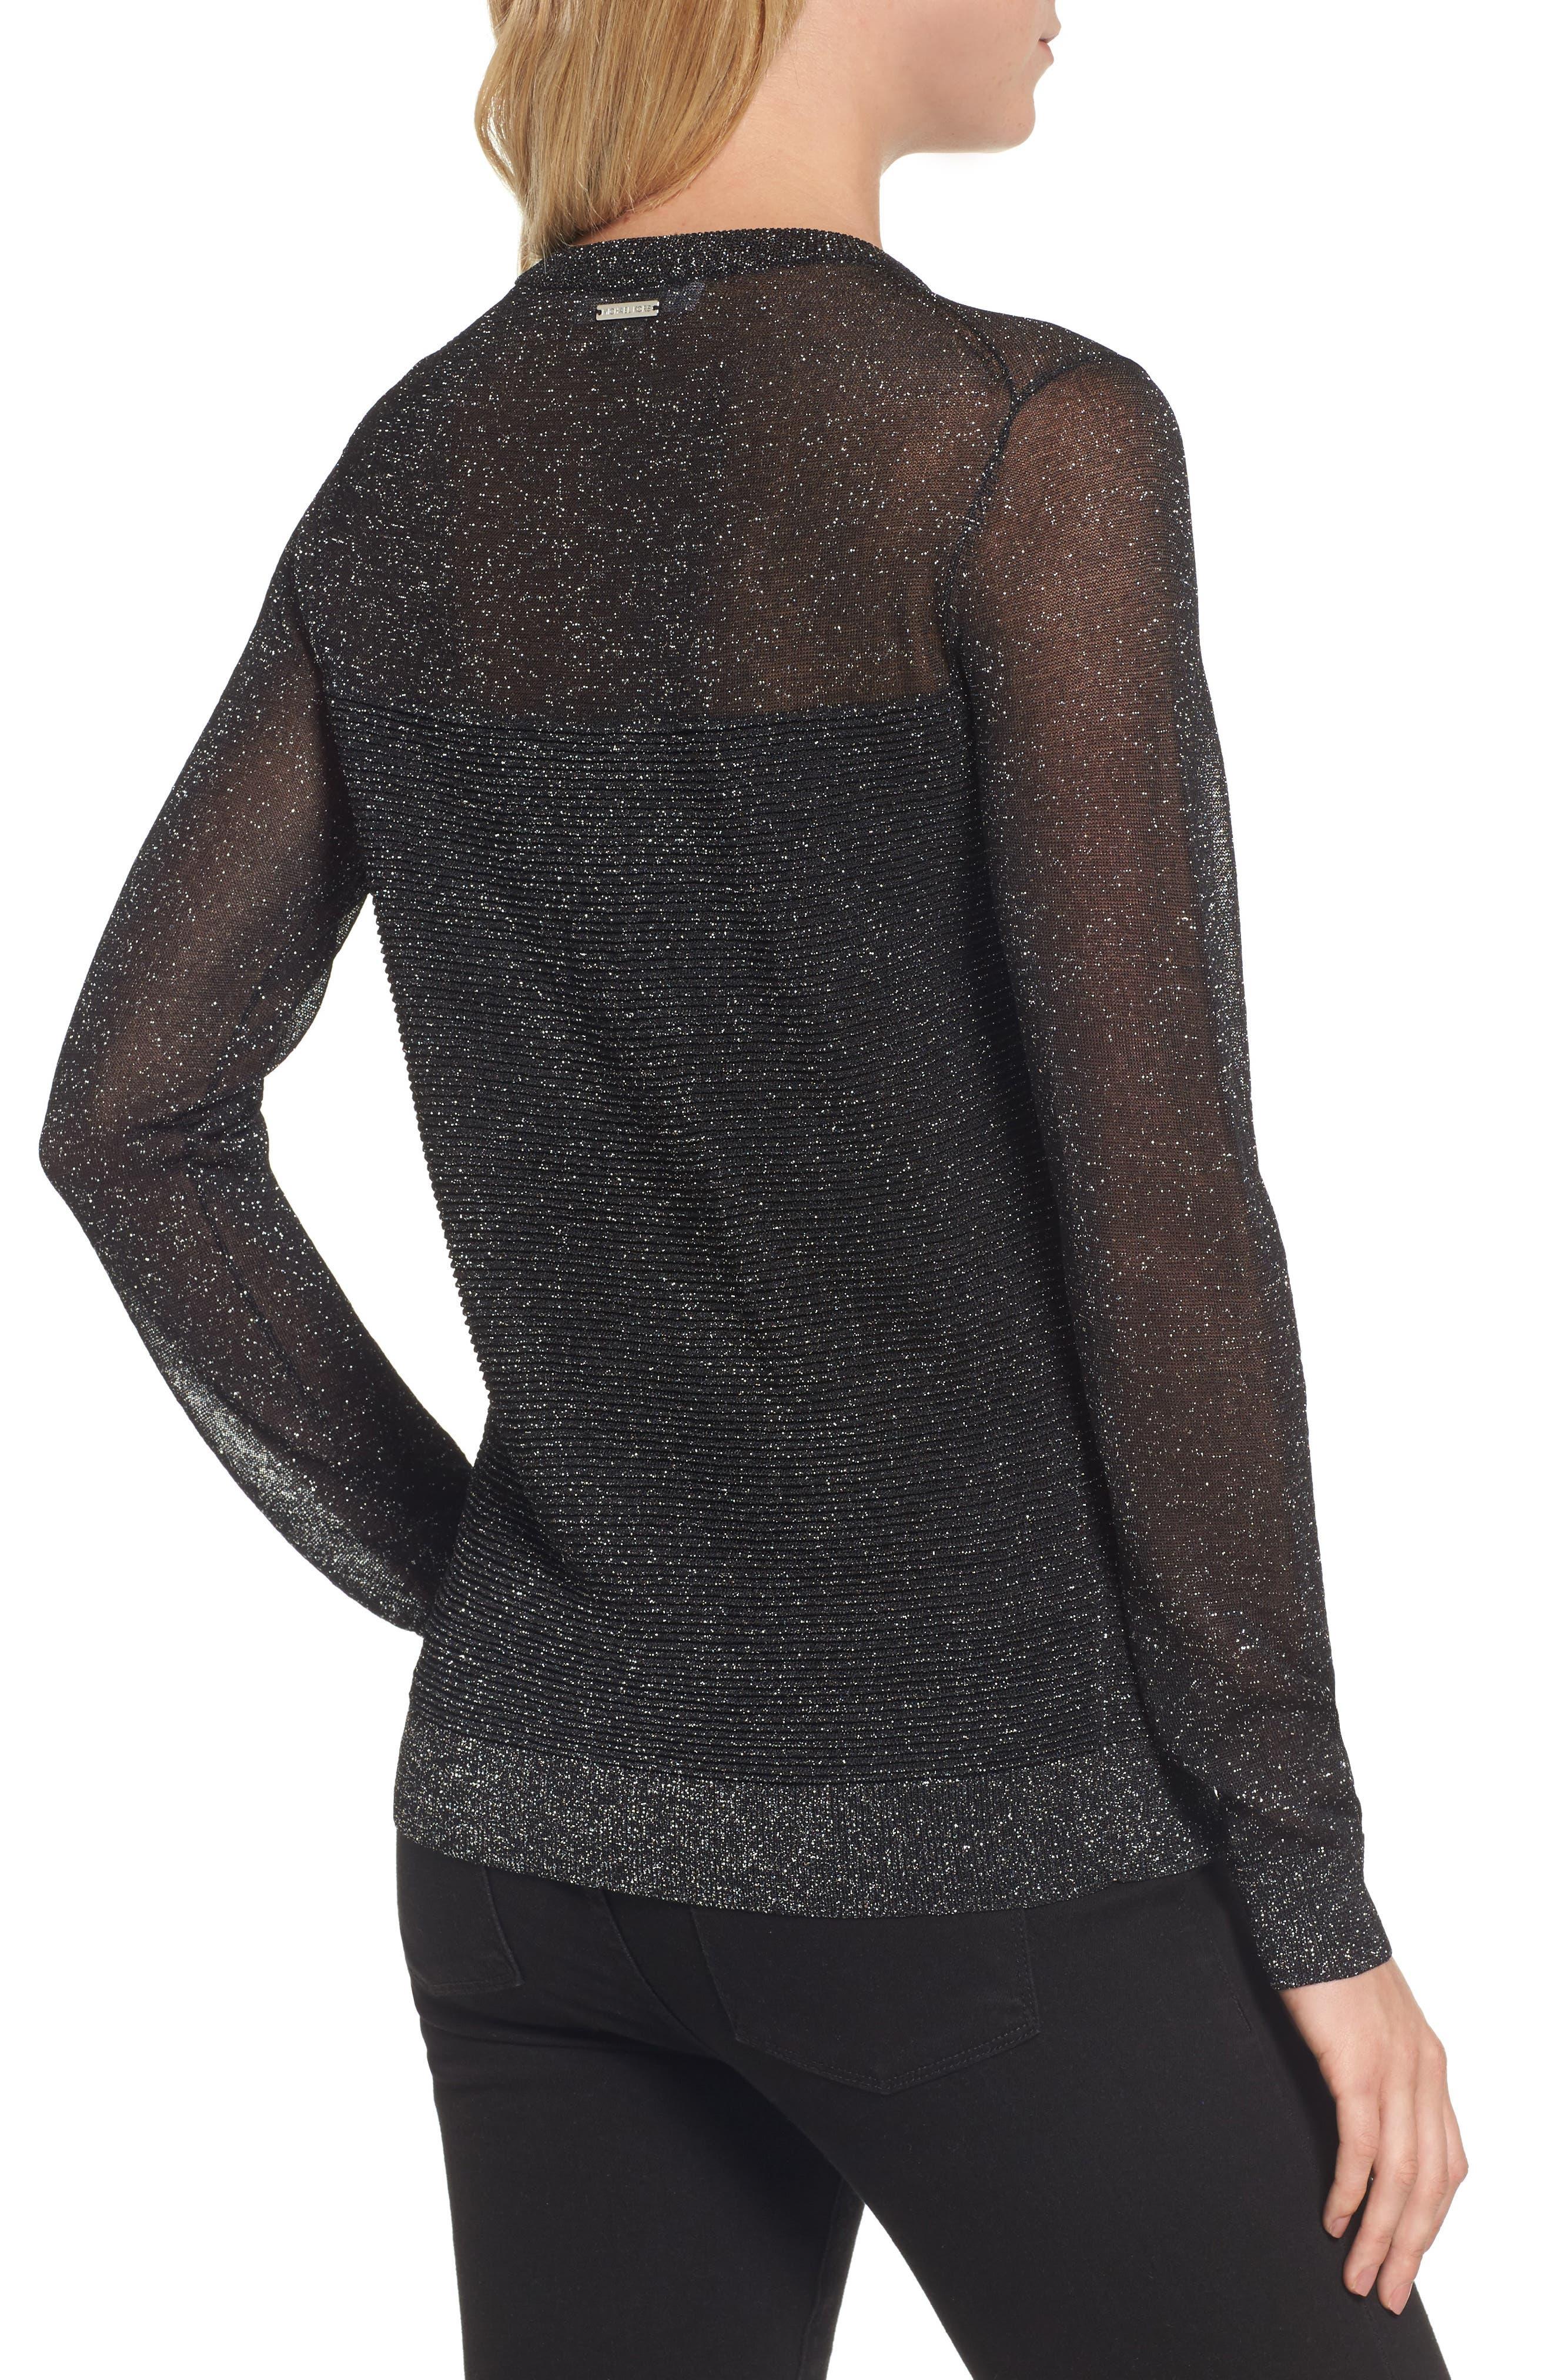 Sheer Metallic Overlay Sweater,                             Alternate thumbnail 2, color,                             001